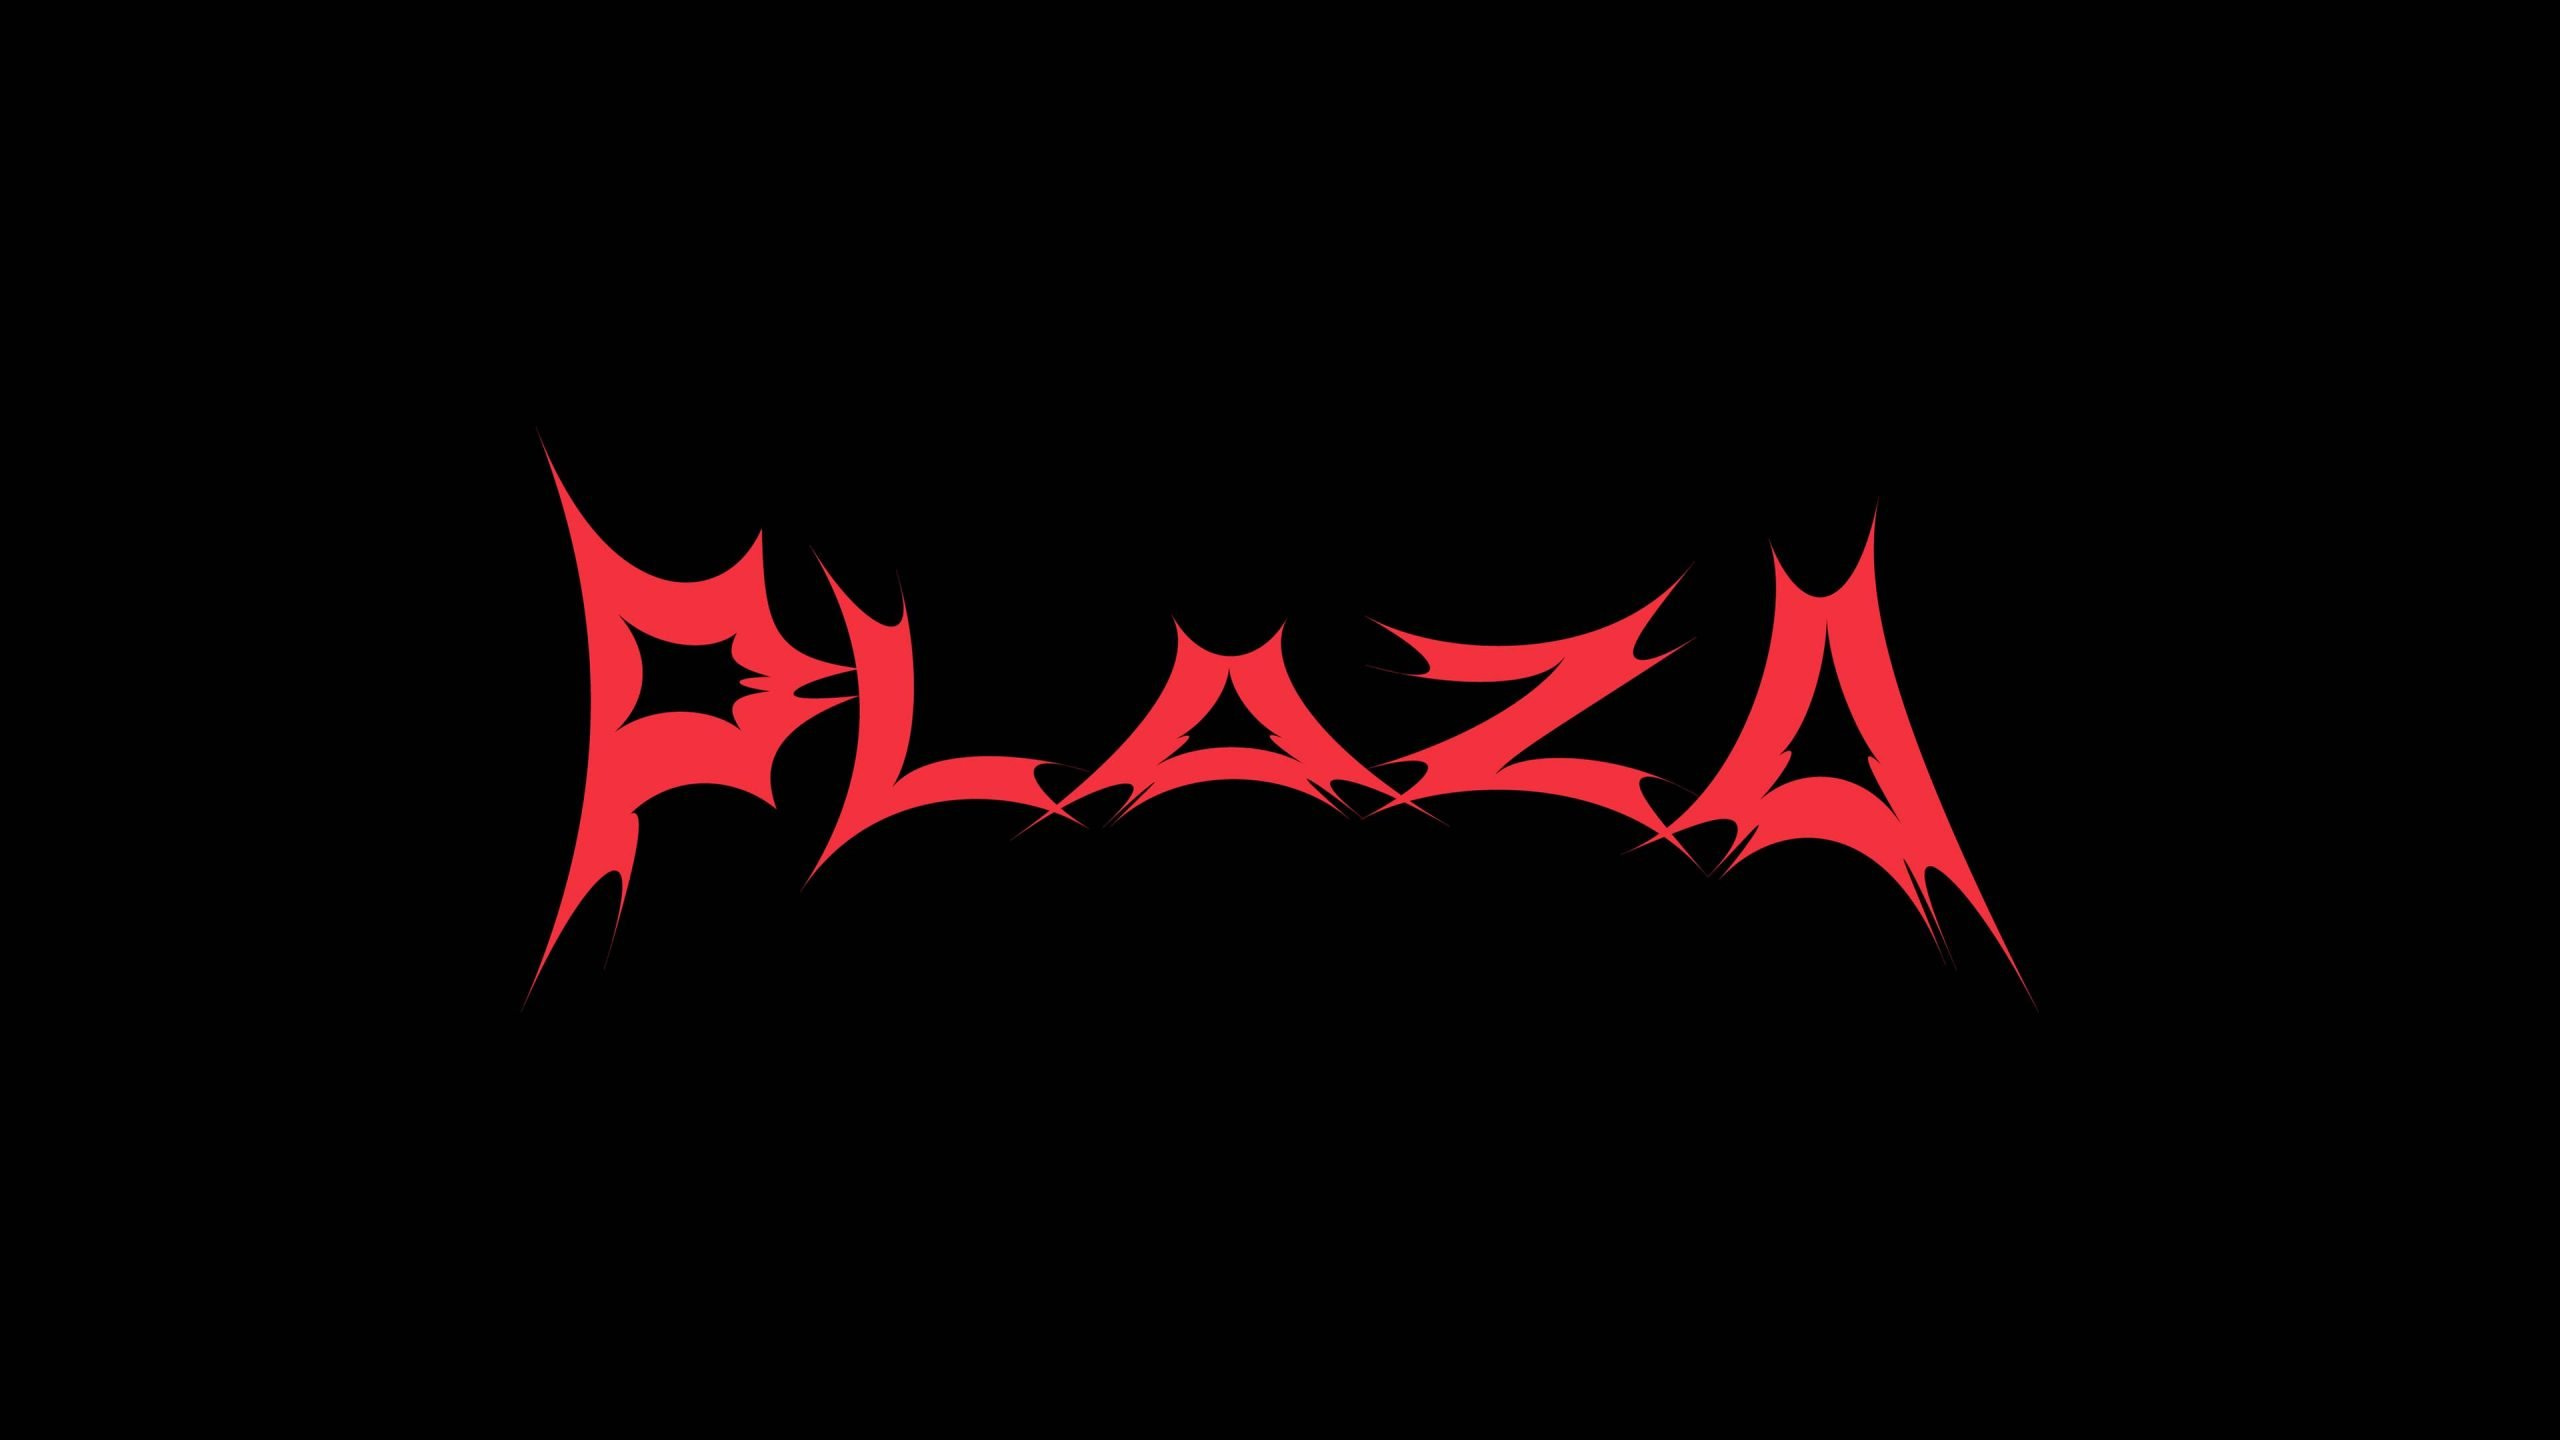 CAPO-PLAZA-TOUR-MERCH-Graphics-07